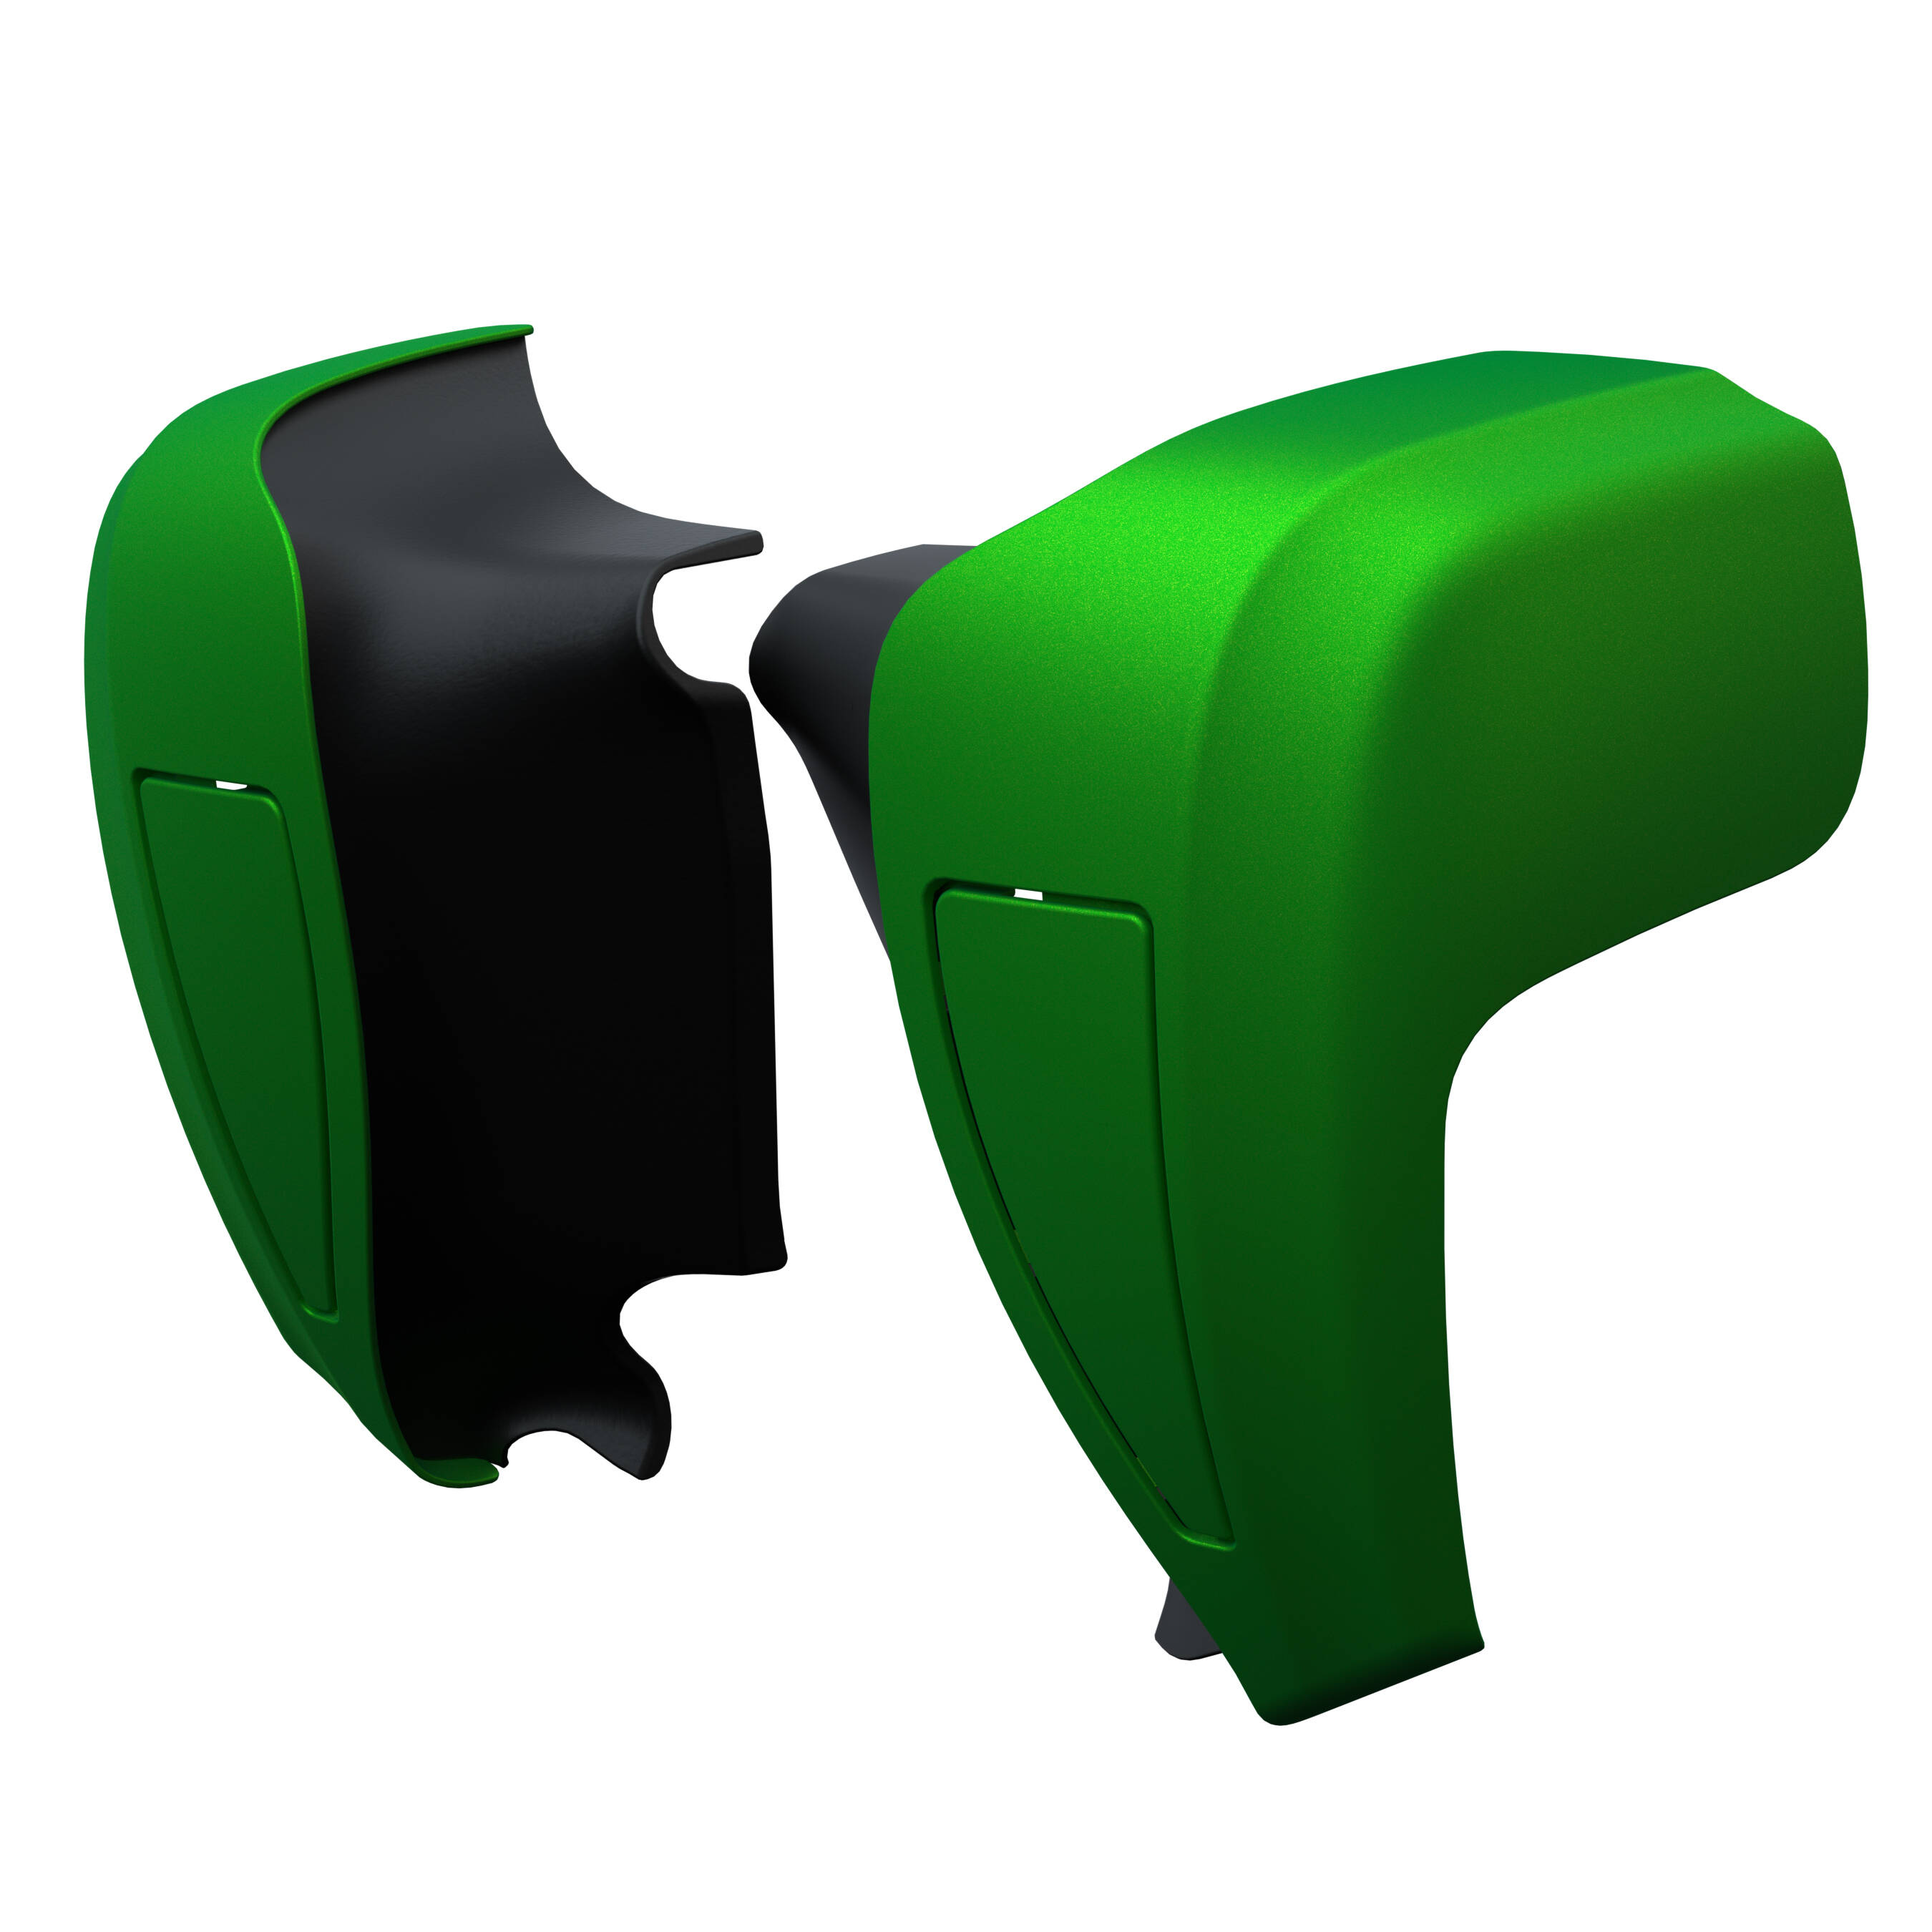 Hard Lower Fairings in Dragon Green, Pair